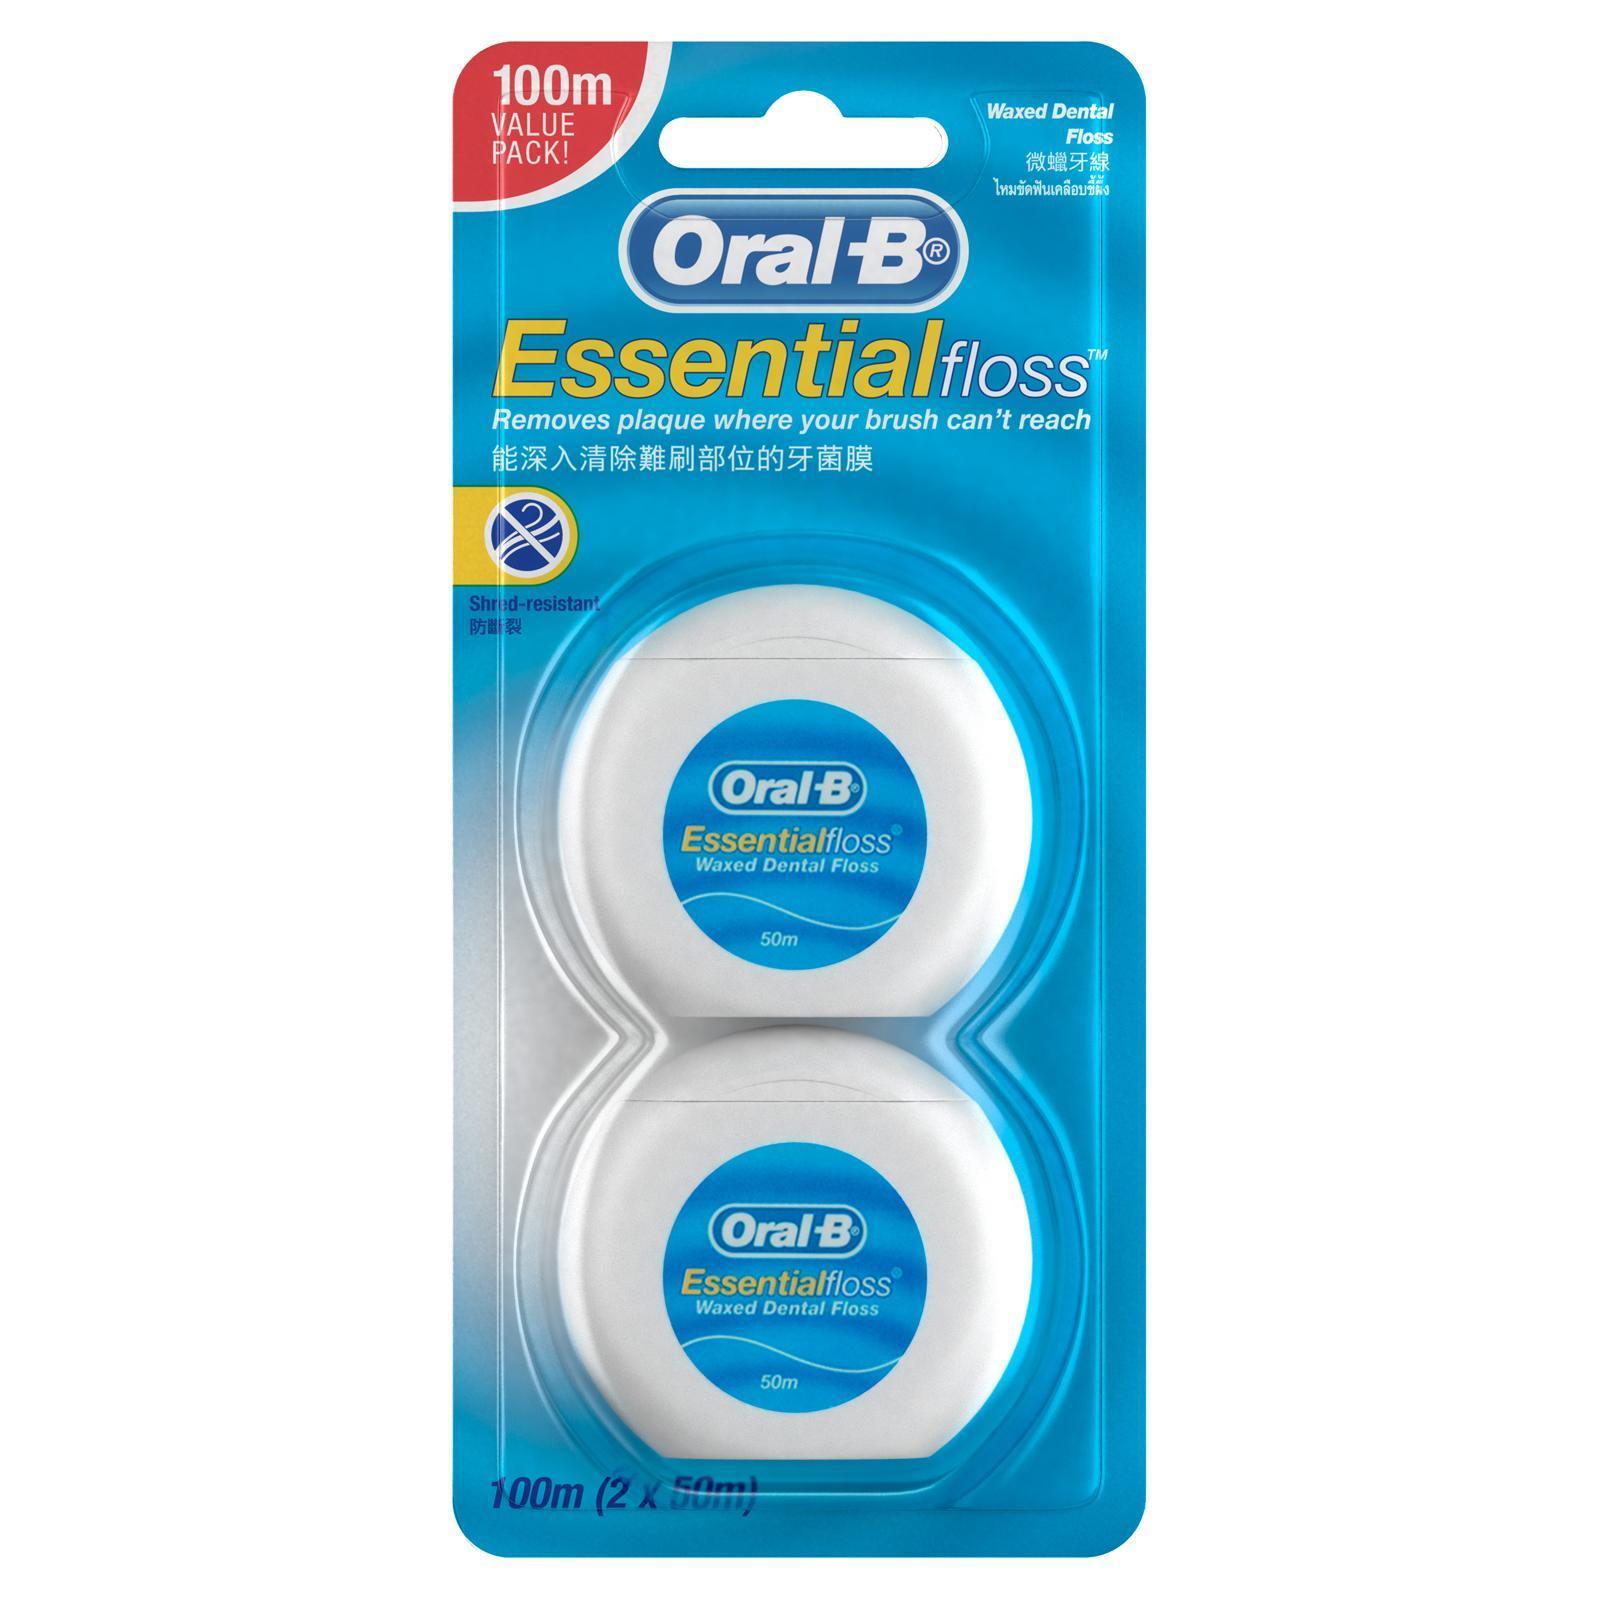 Oral-B EssentialFloss Waxed Dental Floss - 2x50M